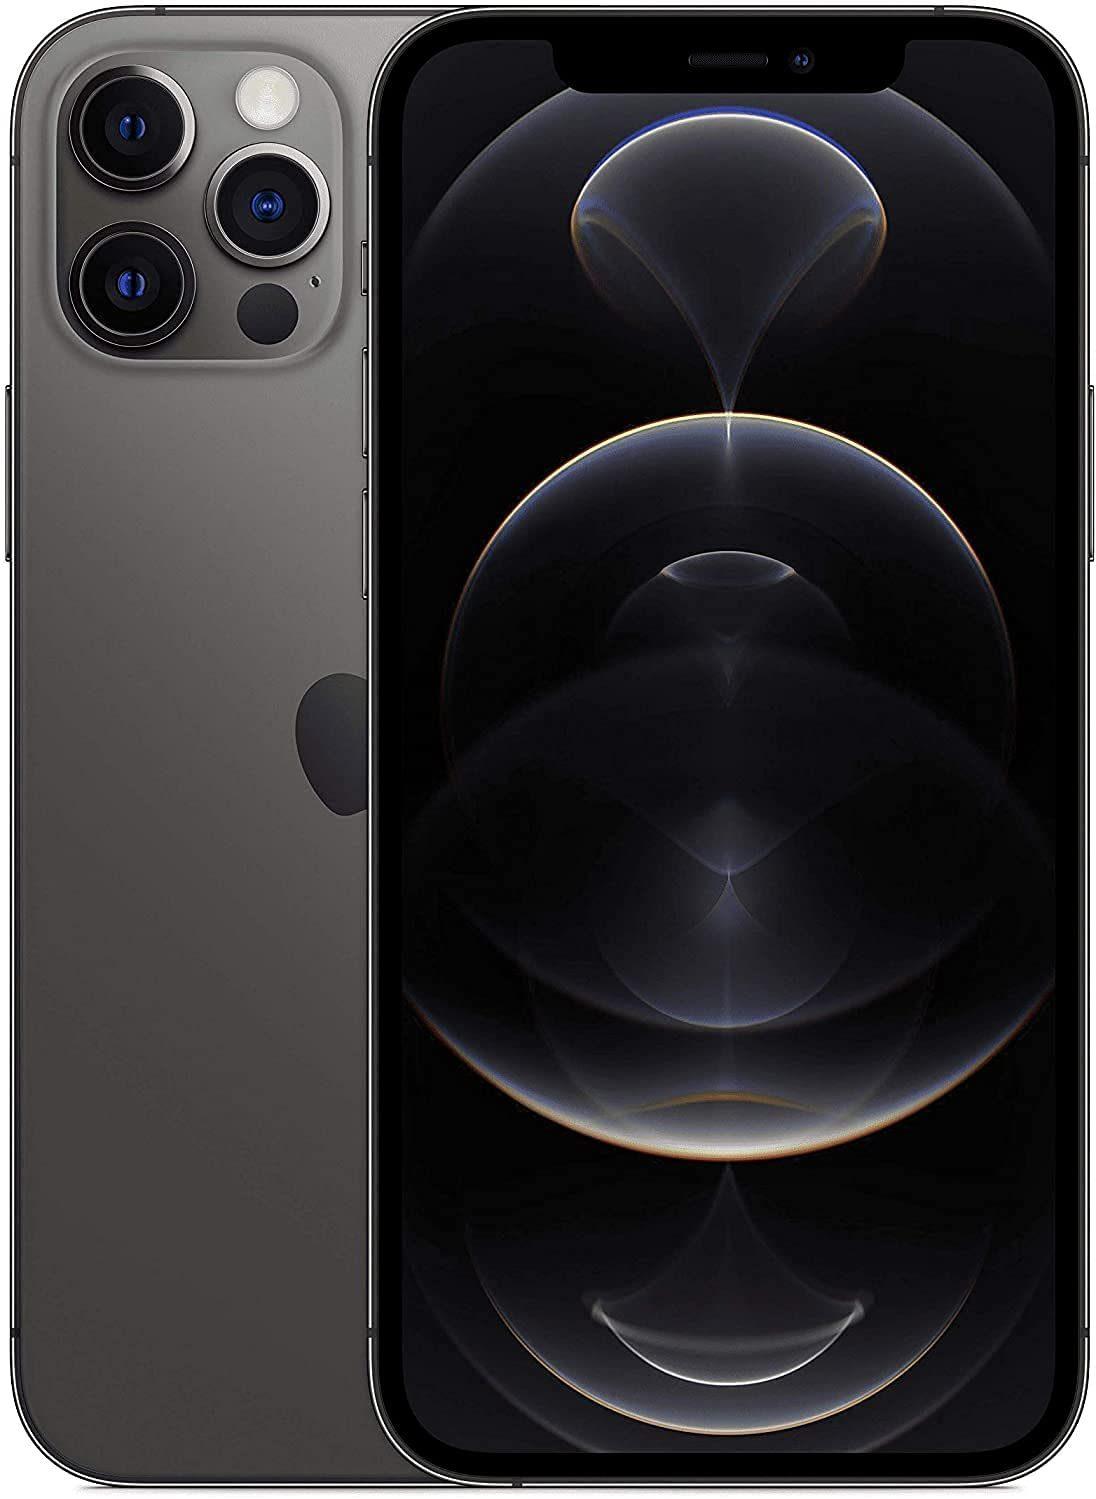 Apple iPhone 12 Pro 256GB (Graphite) – $1,600 at eBay